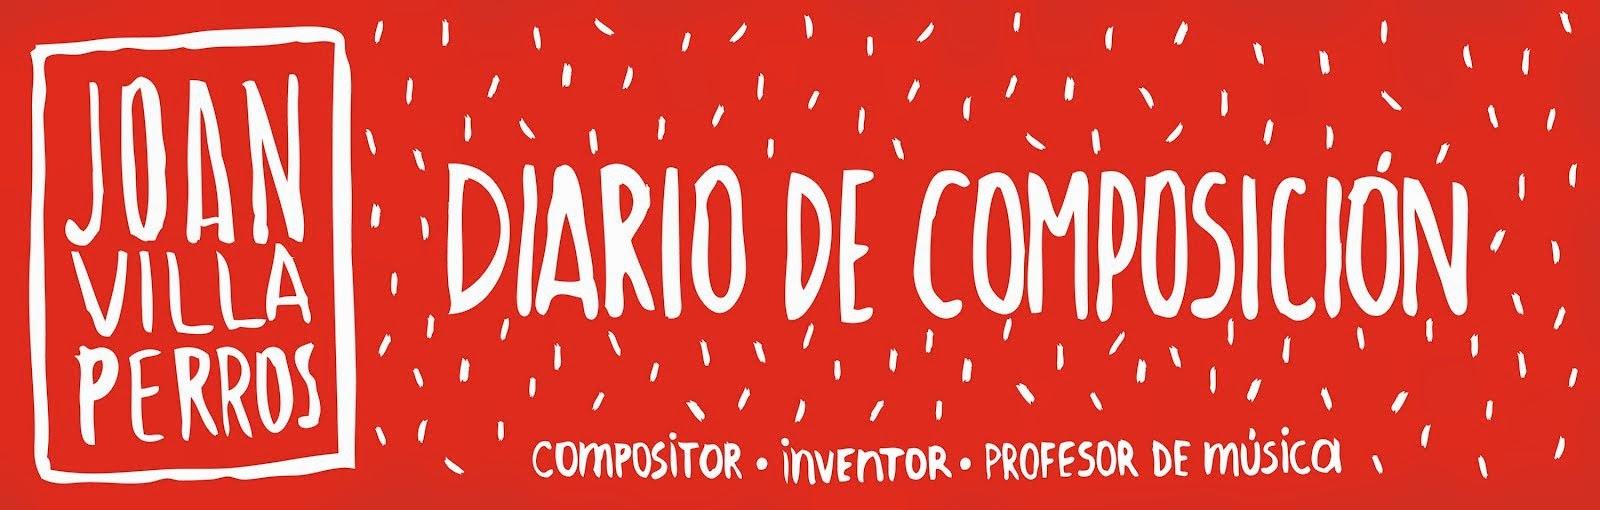 Joan_Villaperros_Diario_de_composición